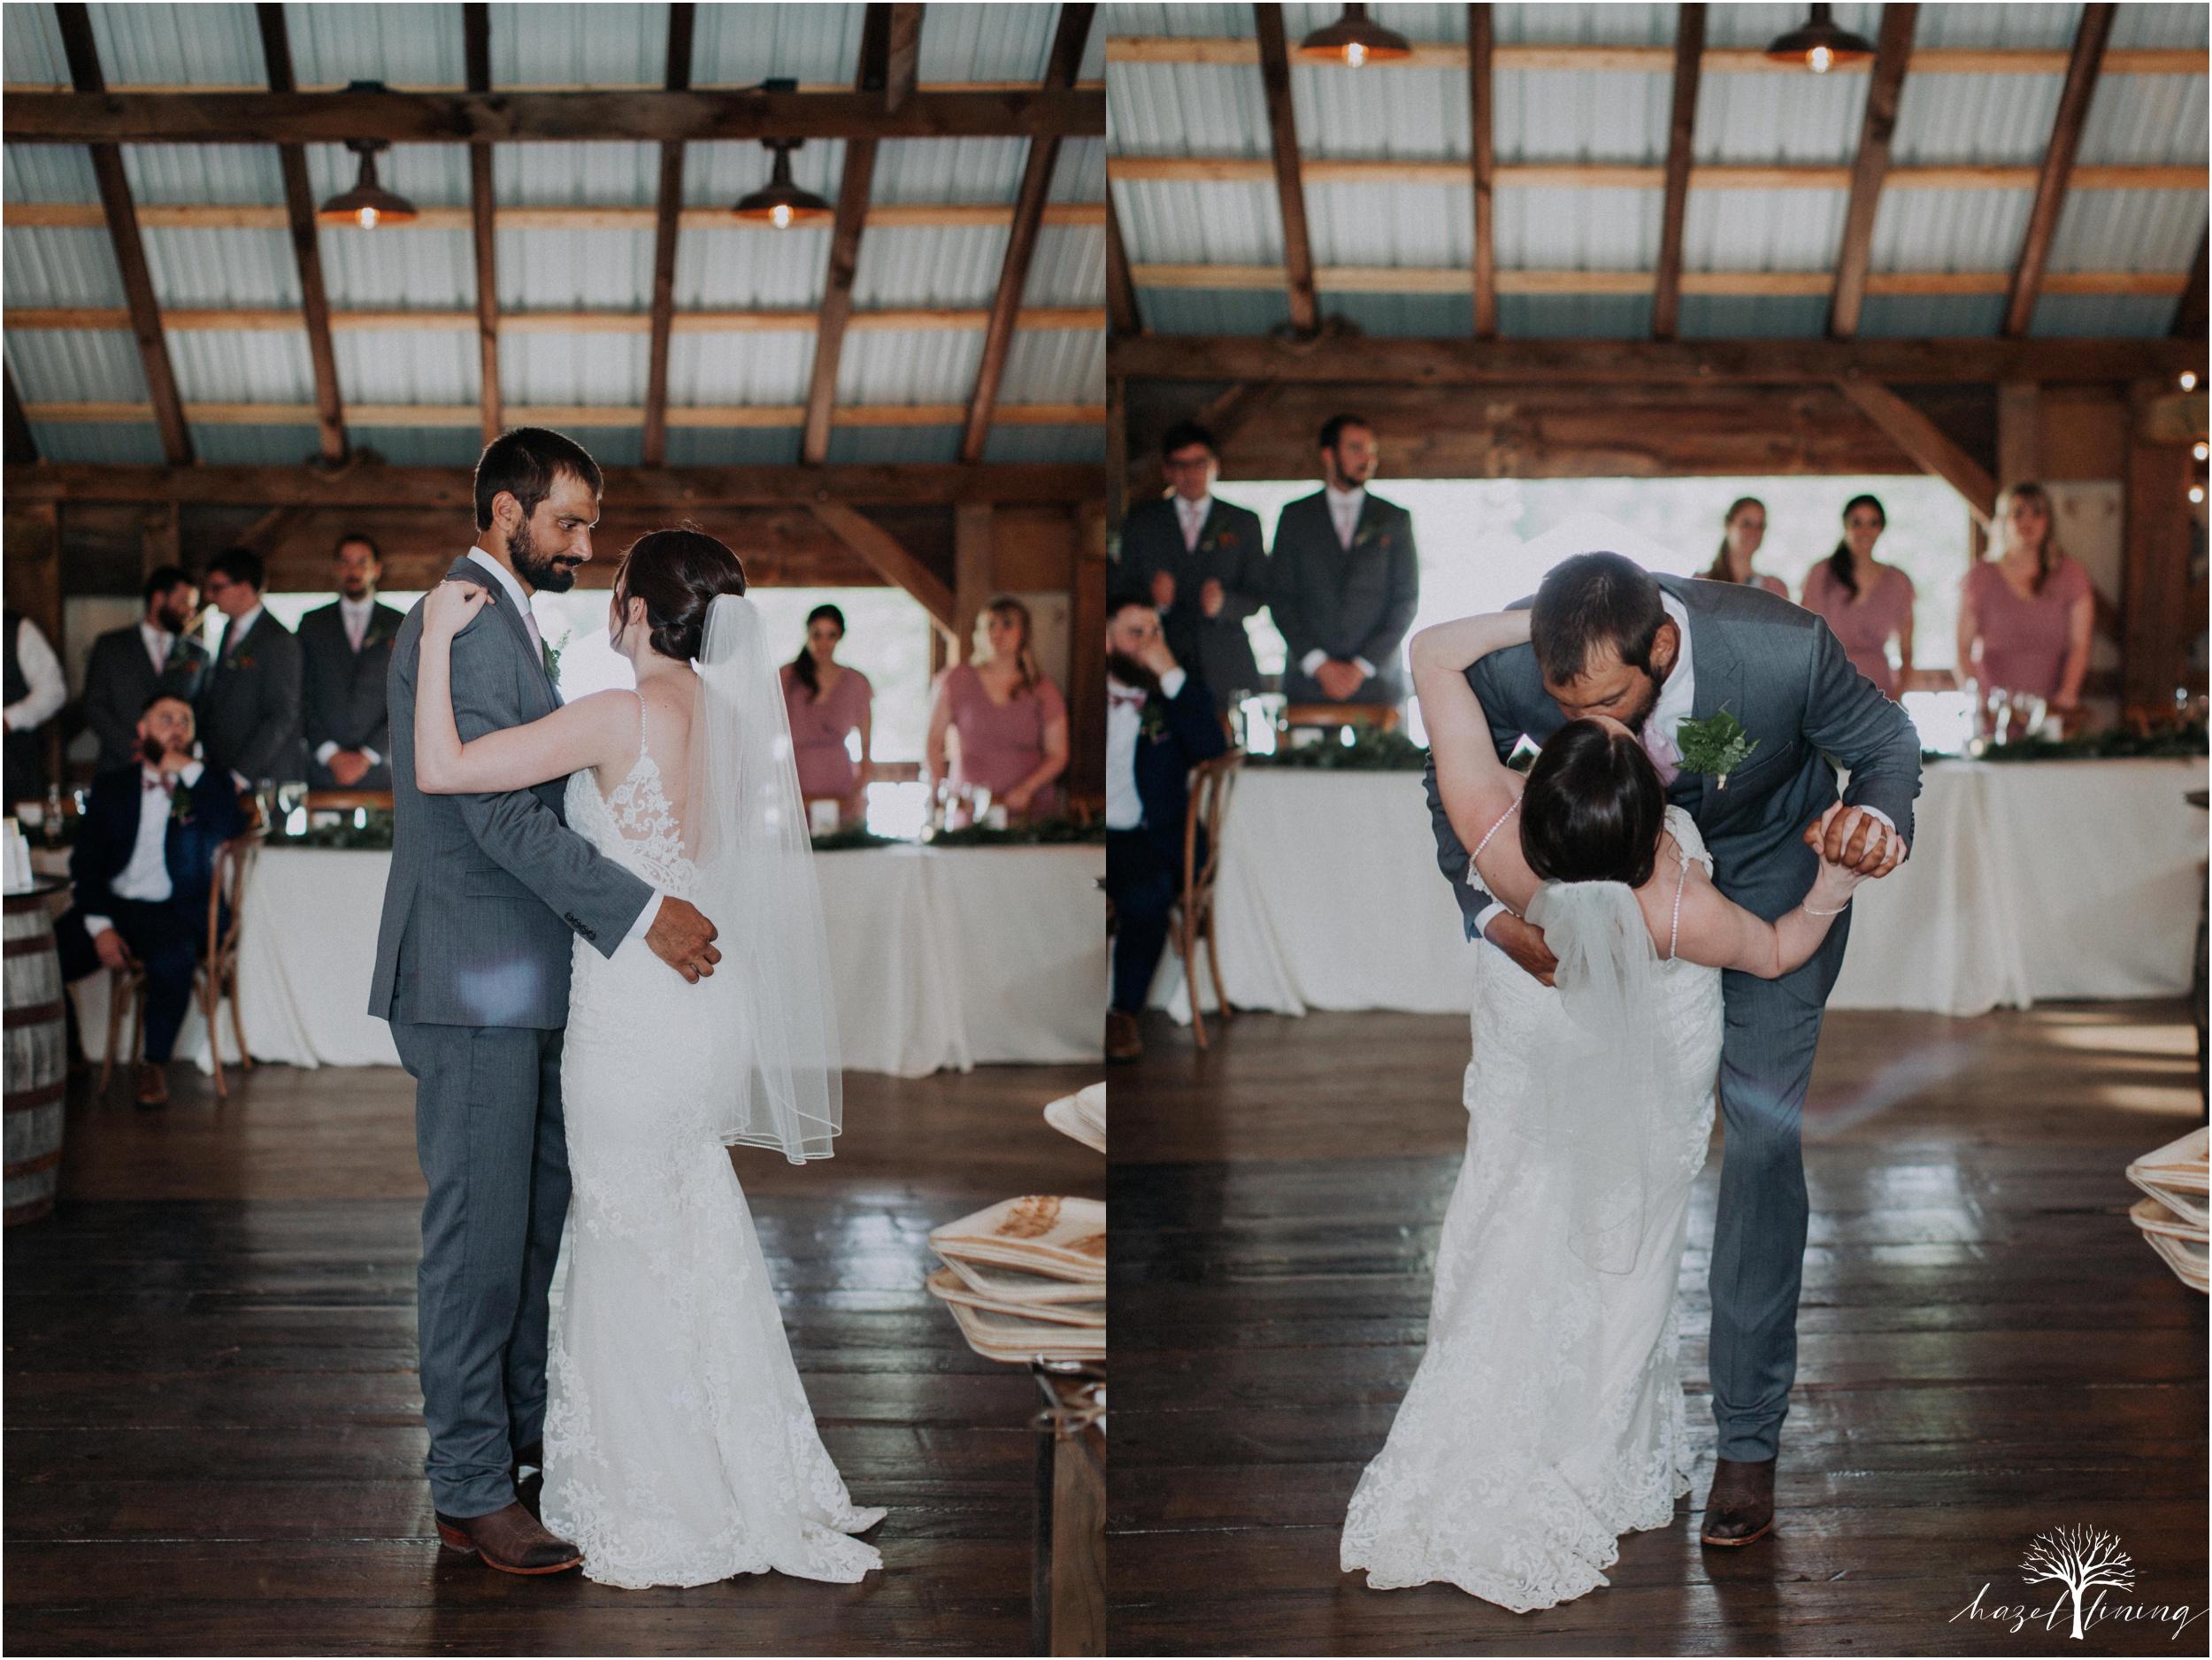 hazel-lining-travel-wedding-elopement-photography-lisa-landon-shoemaker-the-farm-bakery-and-events-bucks-county-quakertown-pennsylvania-summer-country-outdoor-farm-wedding_0111.jpg